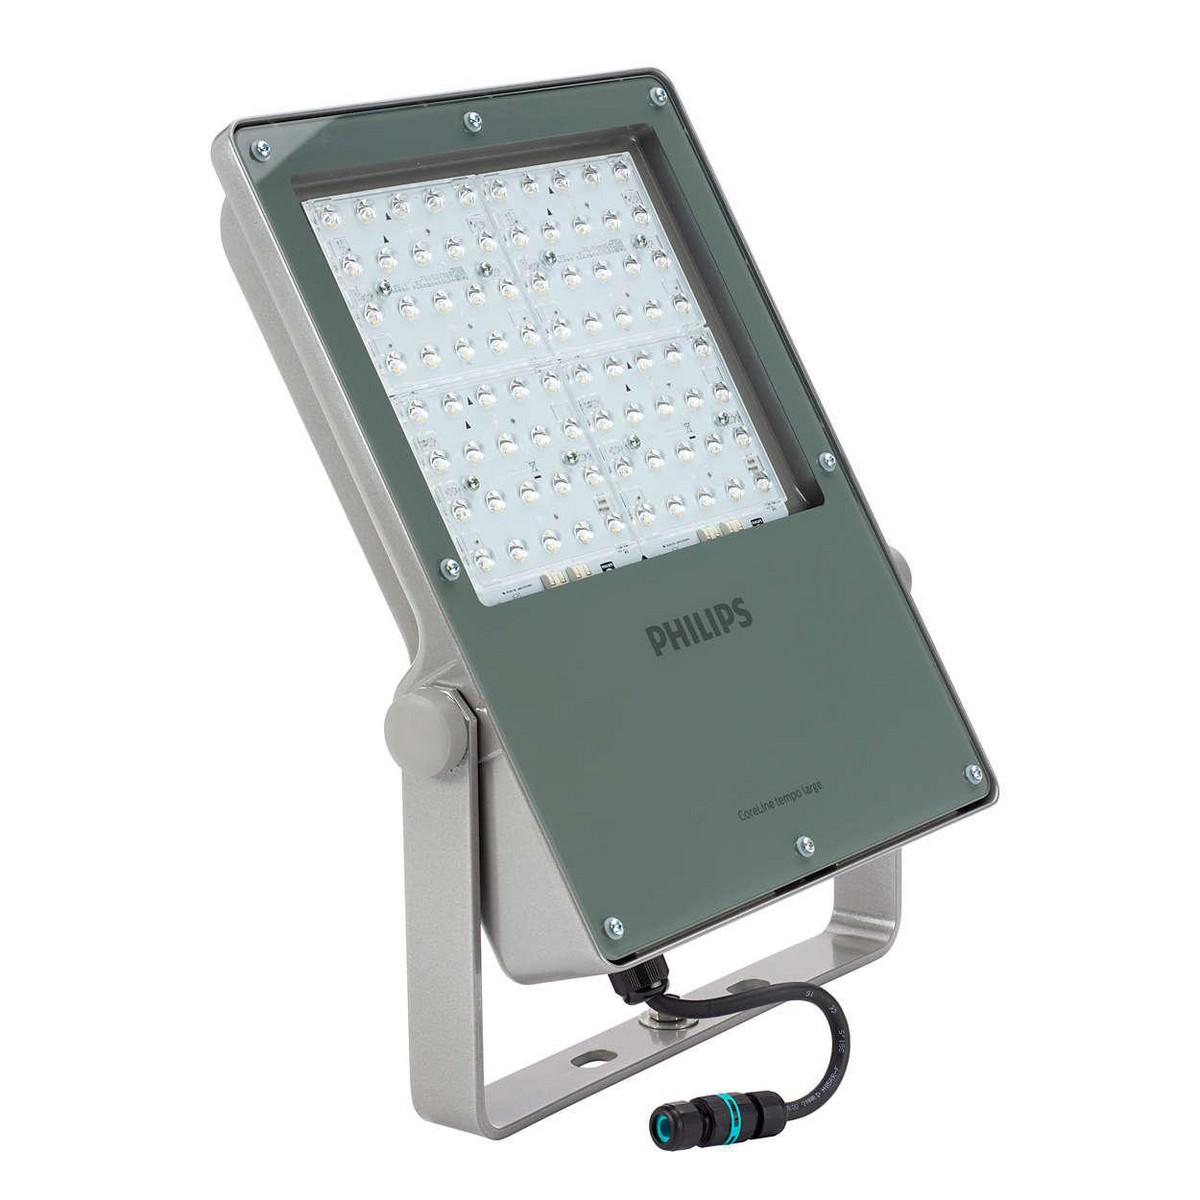 Philips CoreLine Tempo Projektør BVP130 26000Lm/740 217W IP65 IK08 Asymmetrisk